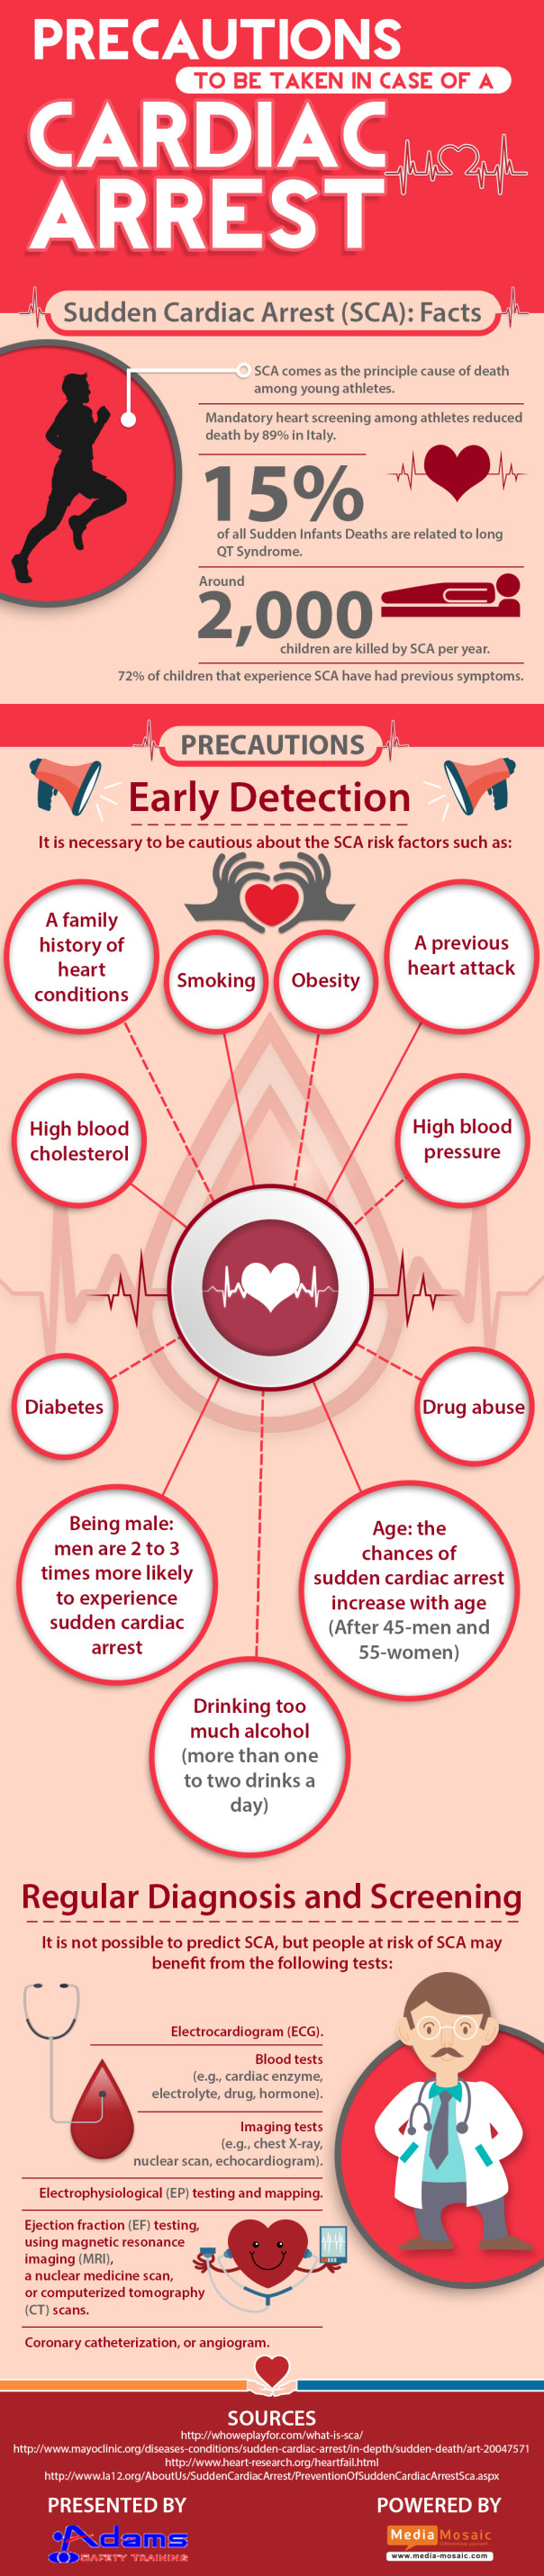 Sudden Cardiac Arrest Infographic